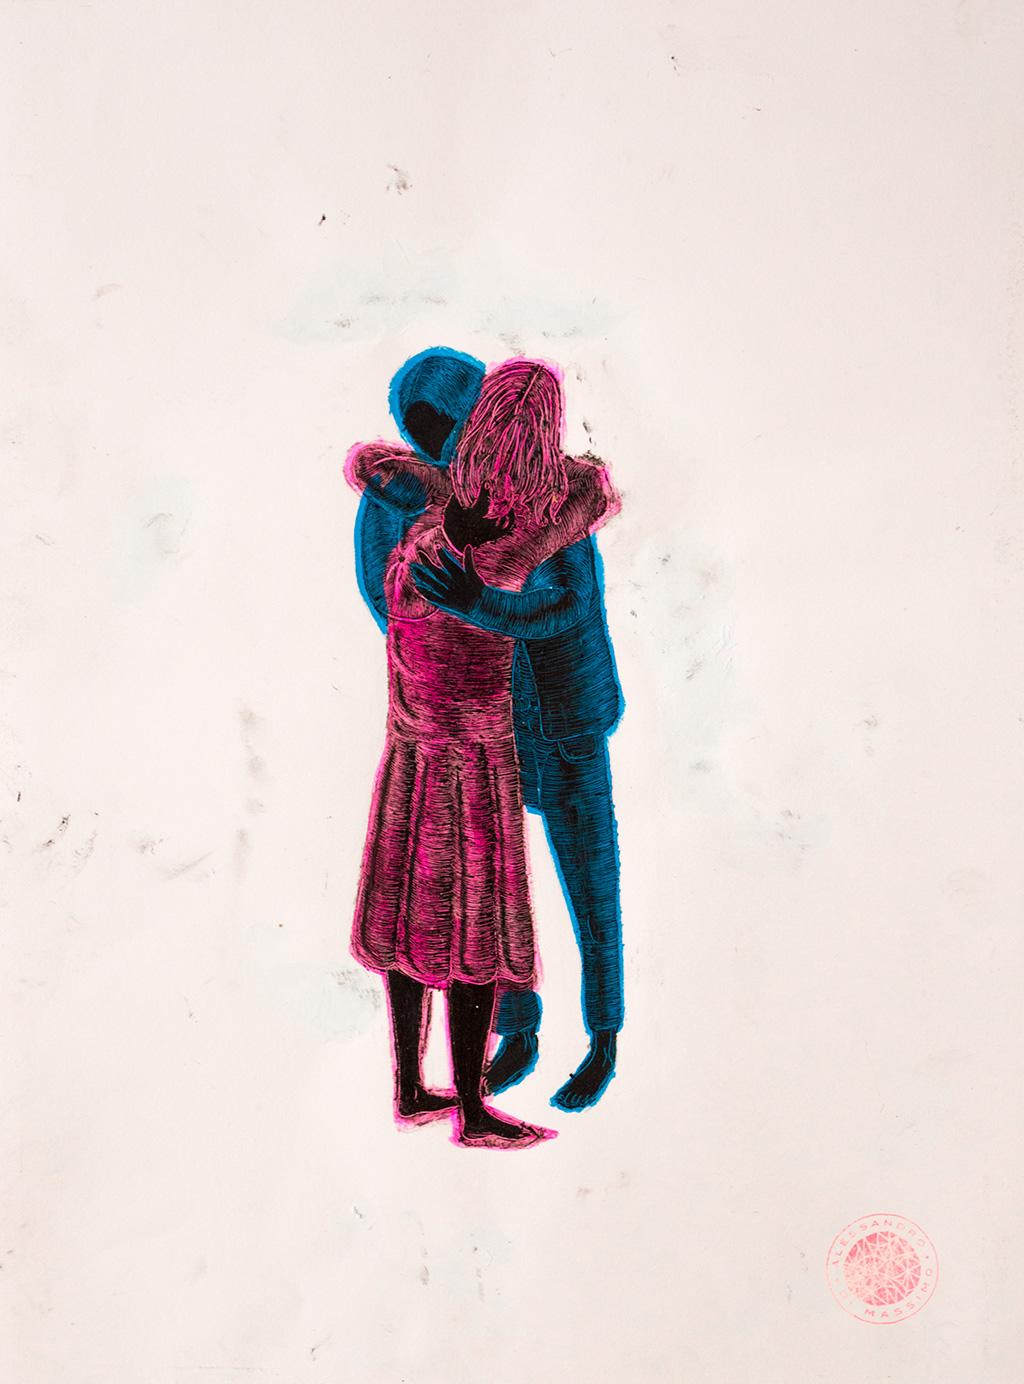 Hug by Alessandro Di Massimo